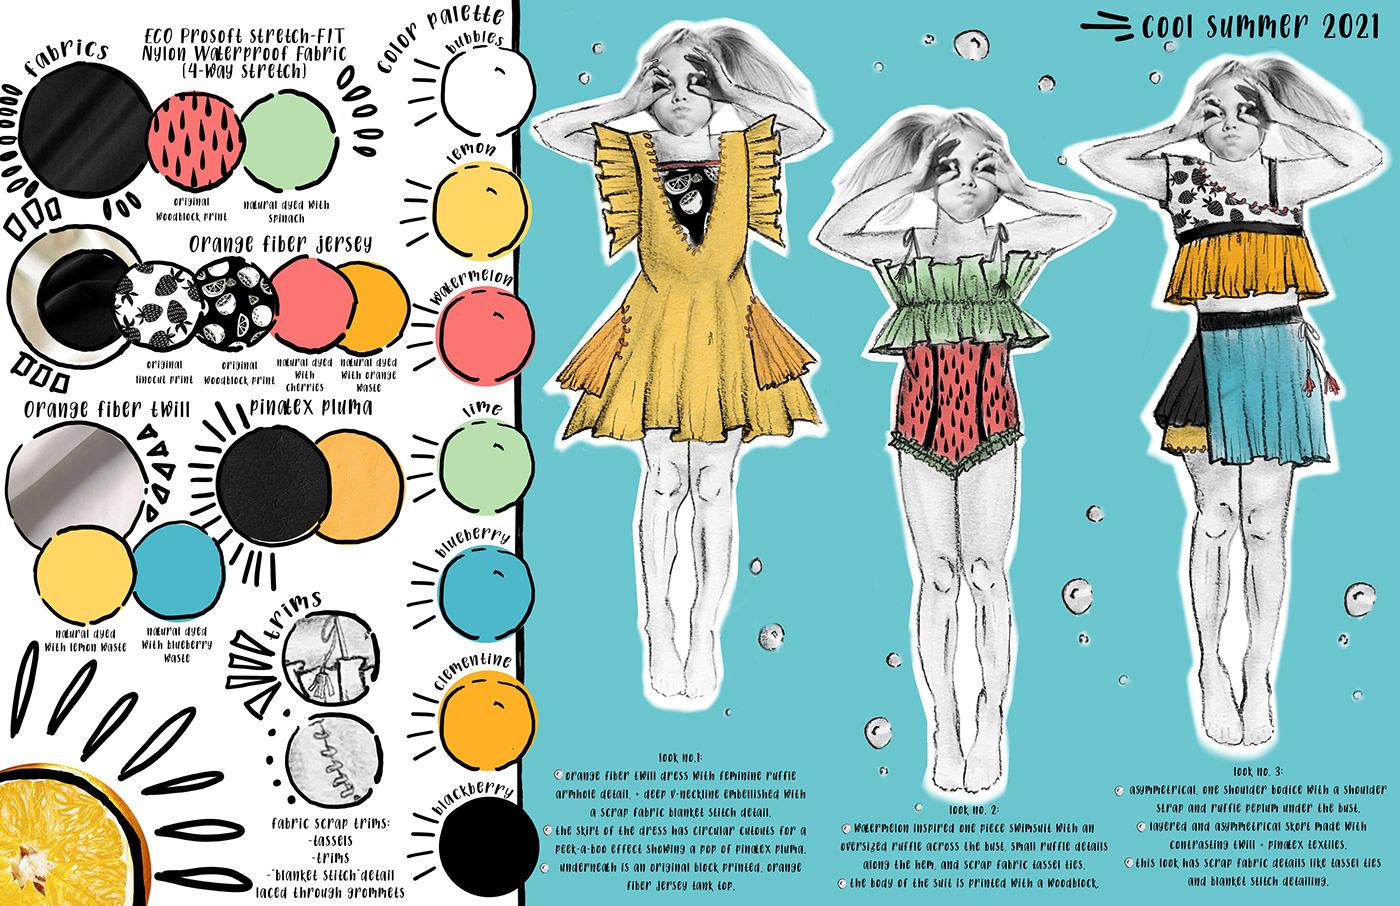 Adobe Photoshop Childrenswear color story concept development eco-friendly fabrication plan fashion design fashion illustration research Sustainability